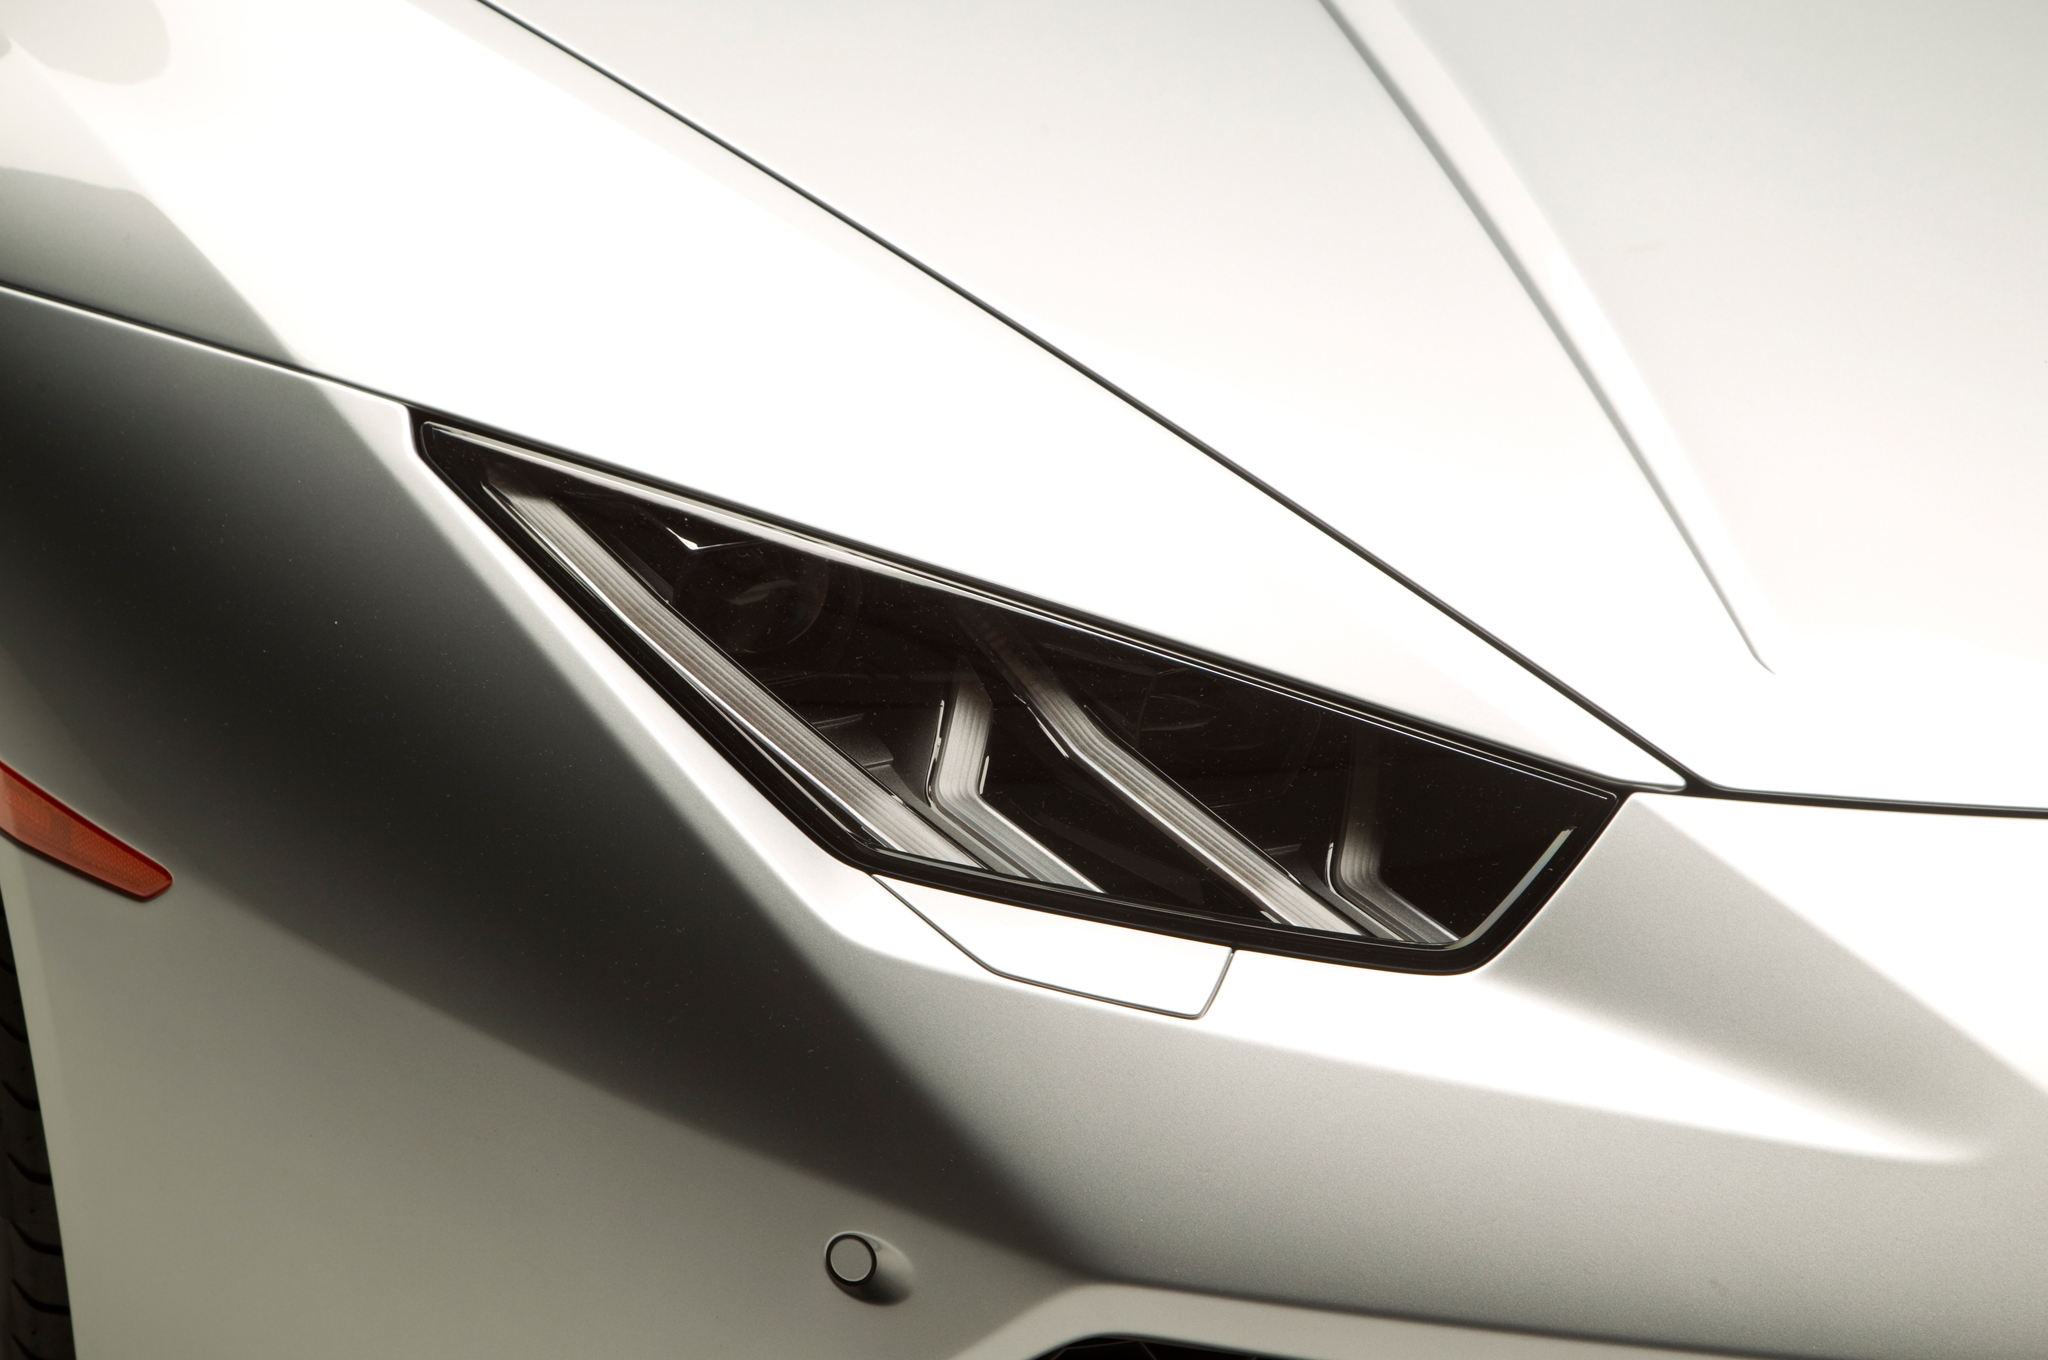 http—image.motortrend.com-f-roadtests-exotic-1312_2015_lamborghini_huracan_first_look-59411873-2015-Lamborghini-Huracan-headlamp